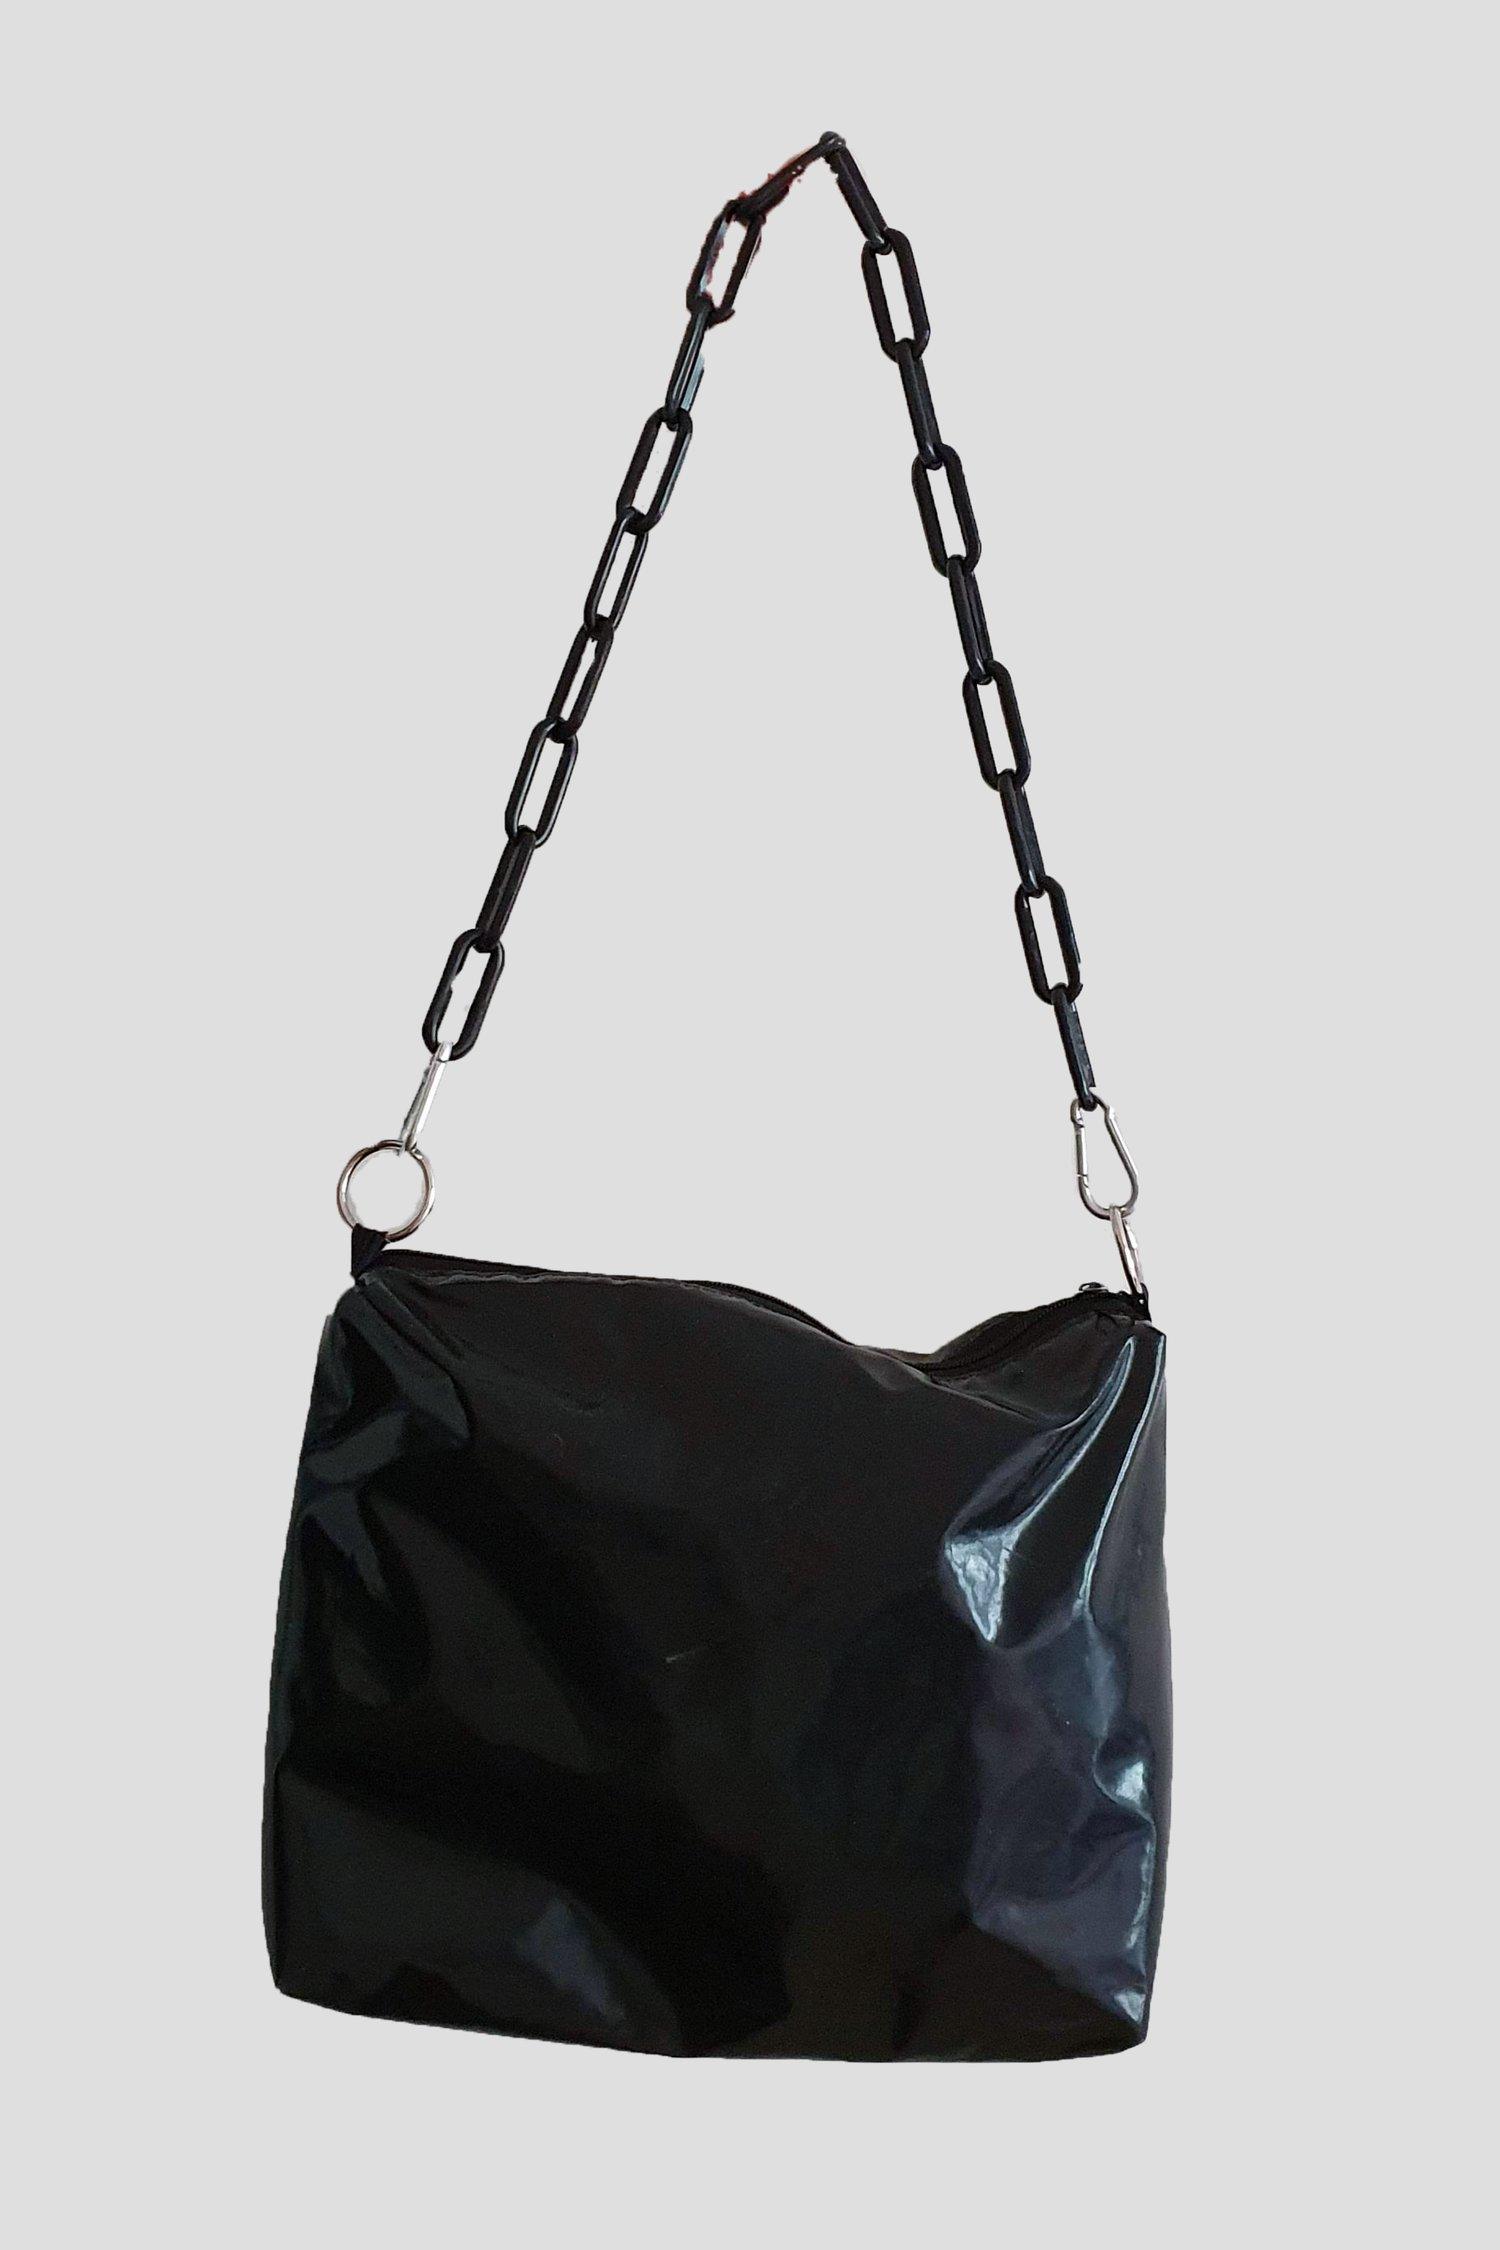 Image of PVC purse